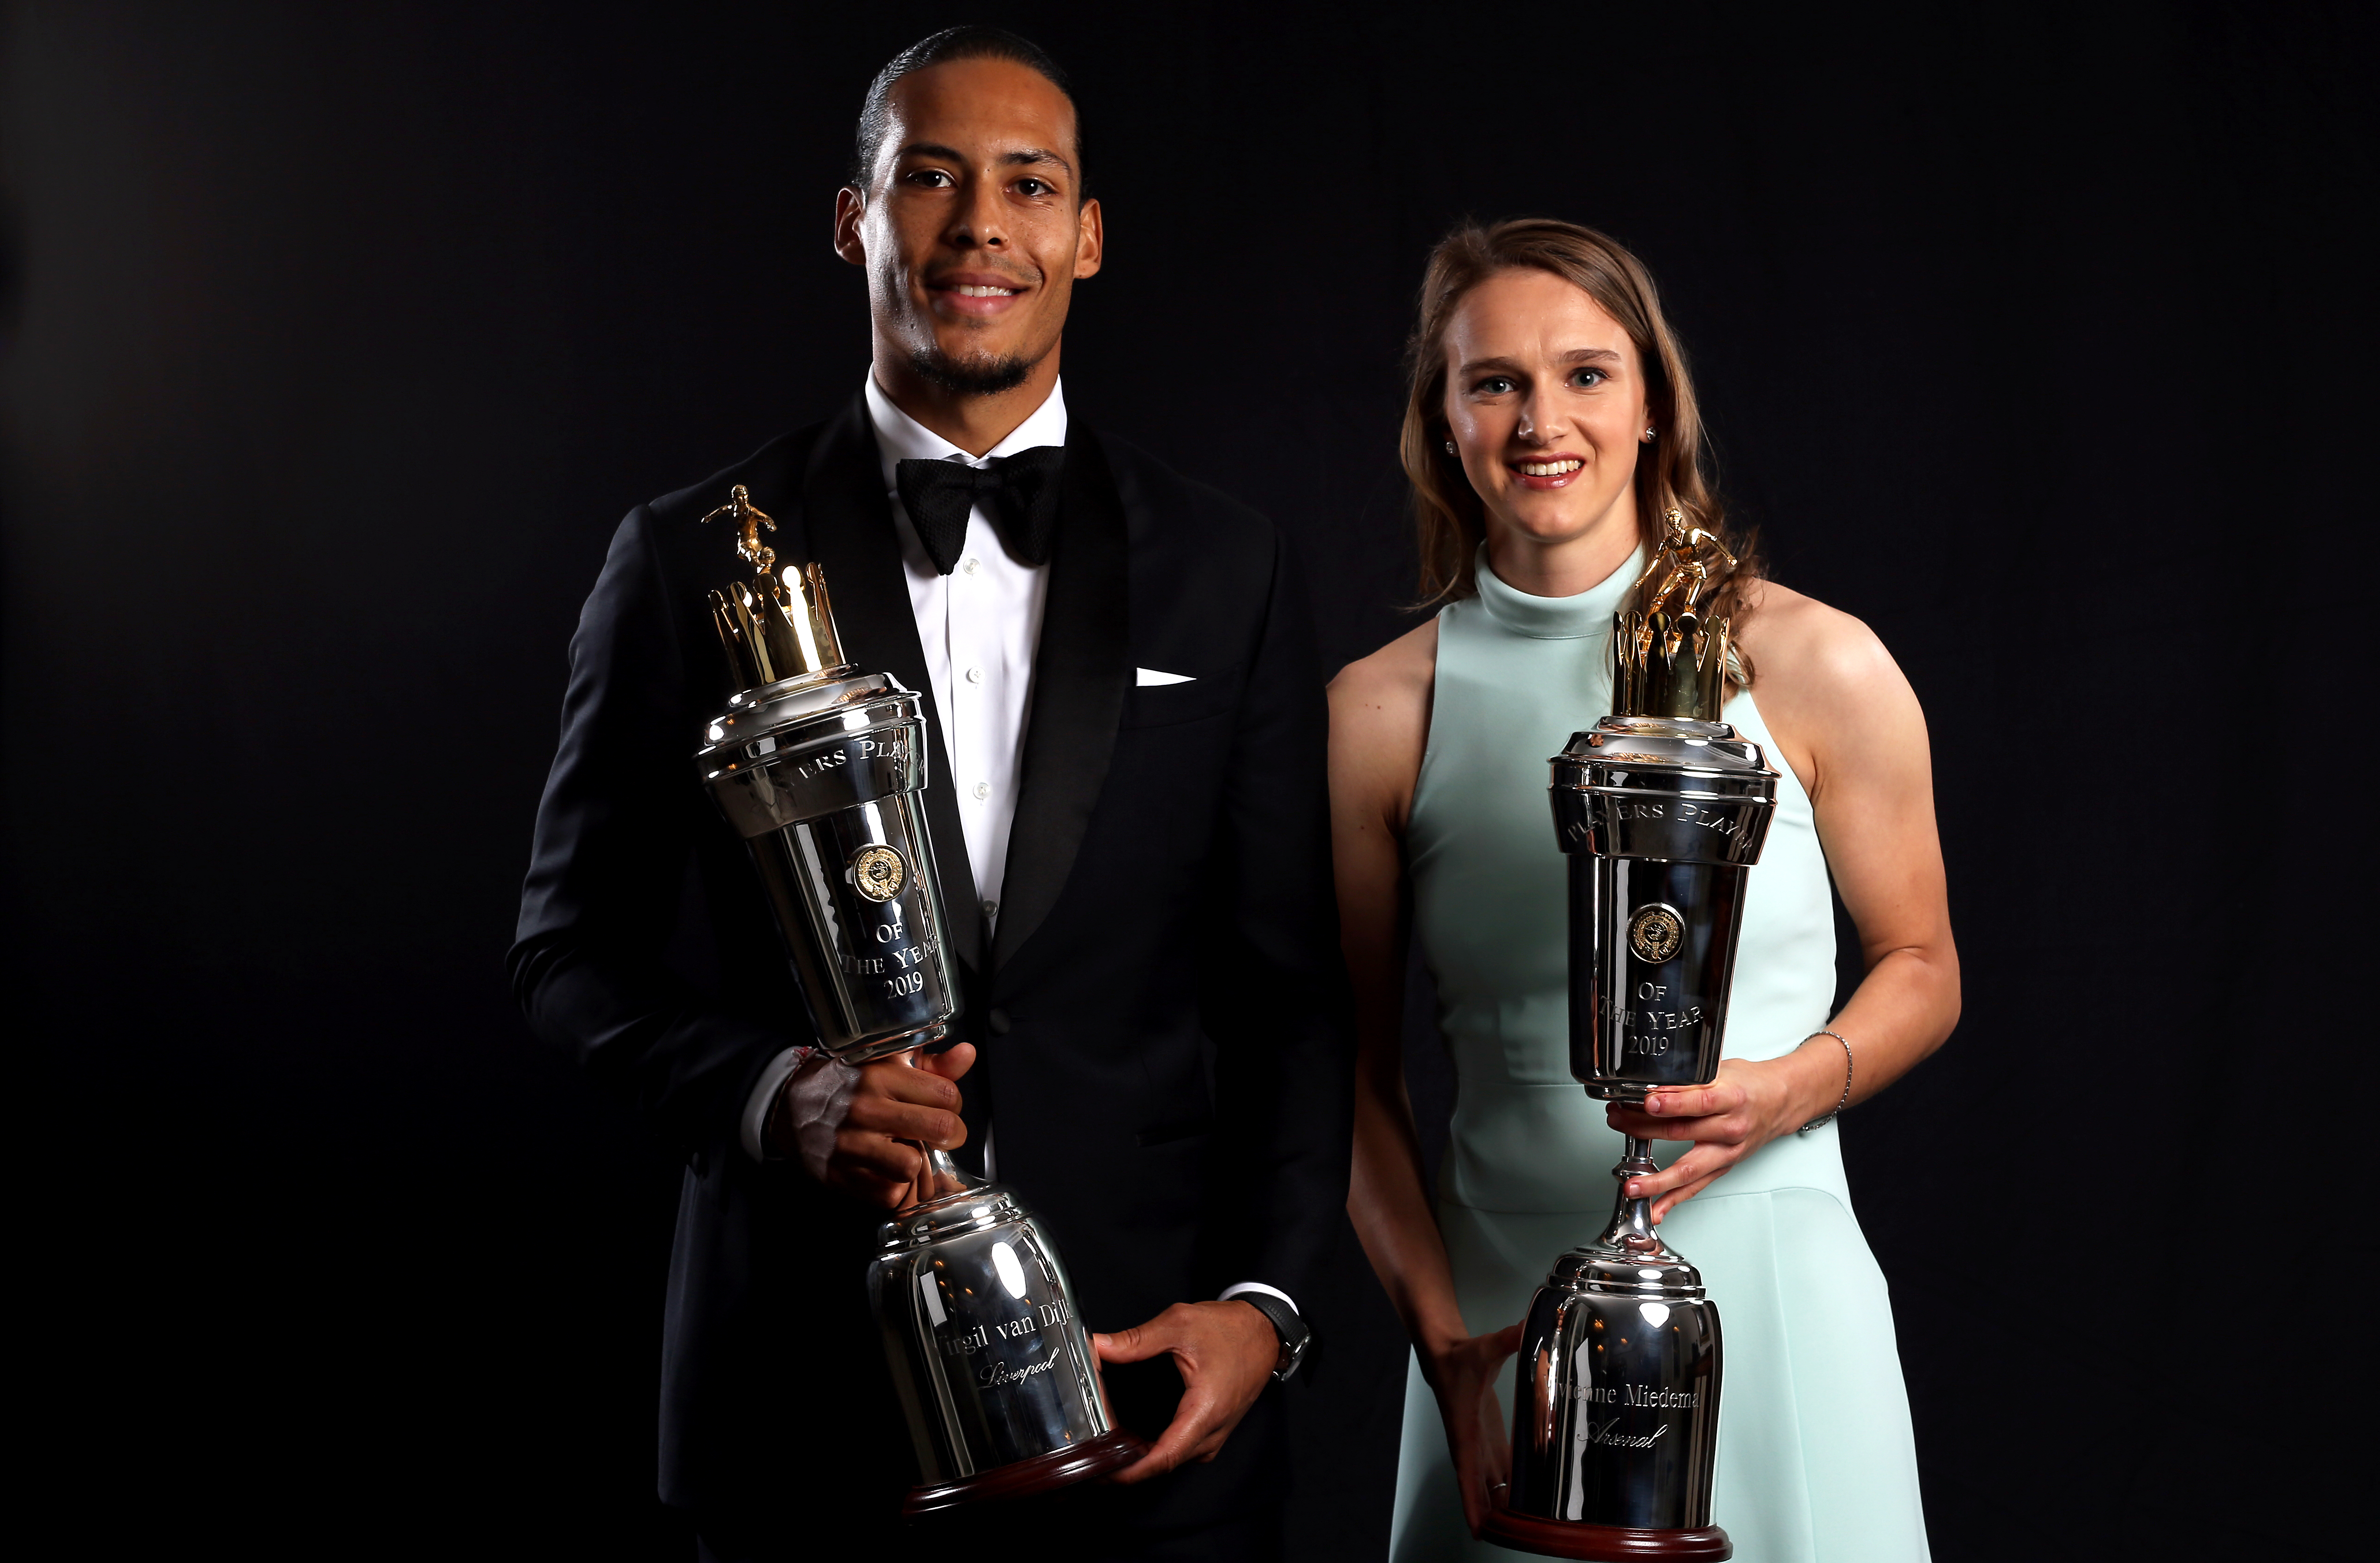 PFA Player of the Year winners Virgil van Dijk and Vivianna Miedema